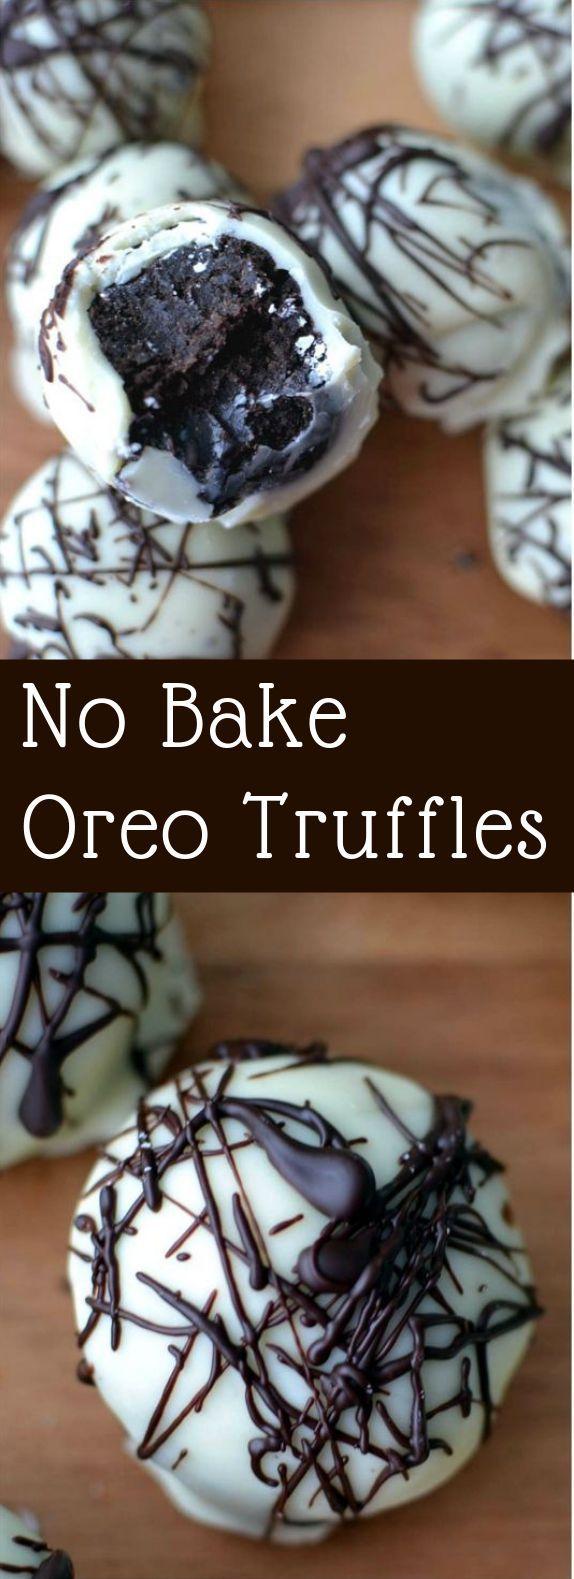 Oreo Trüffel #Oreo #Dessert – #Dessert #Oreo #Tr…